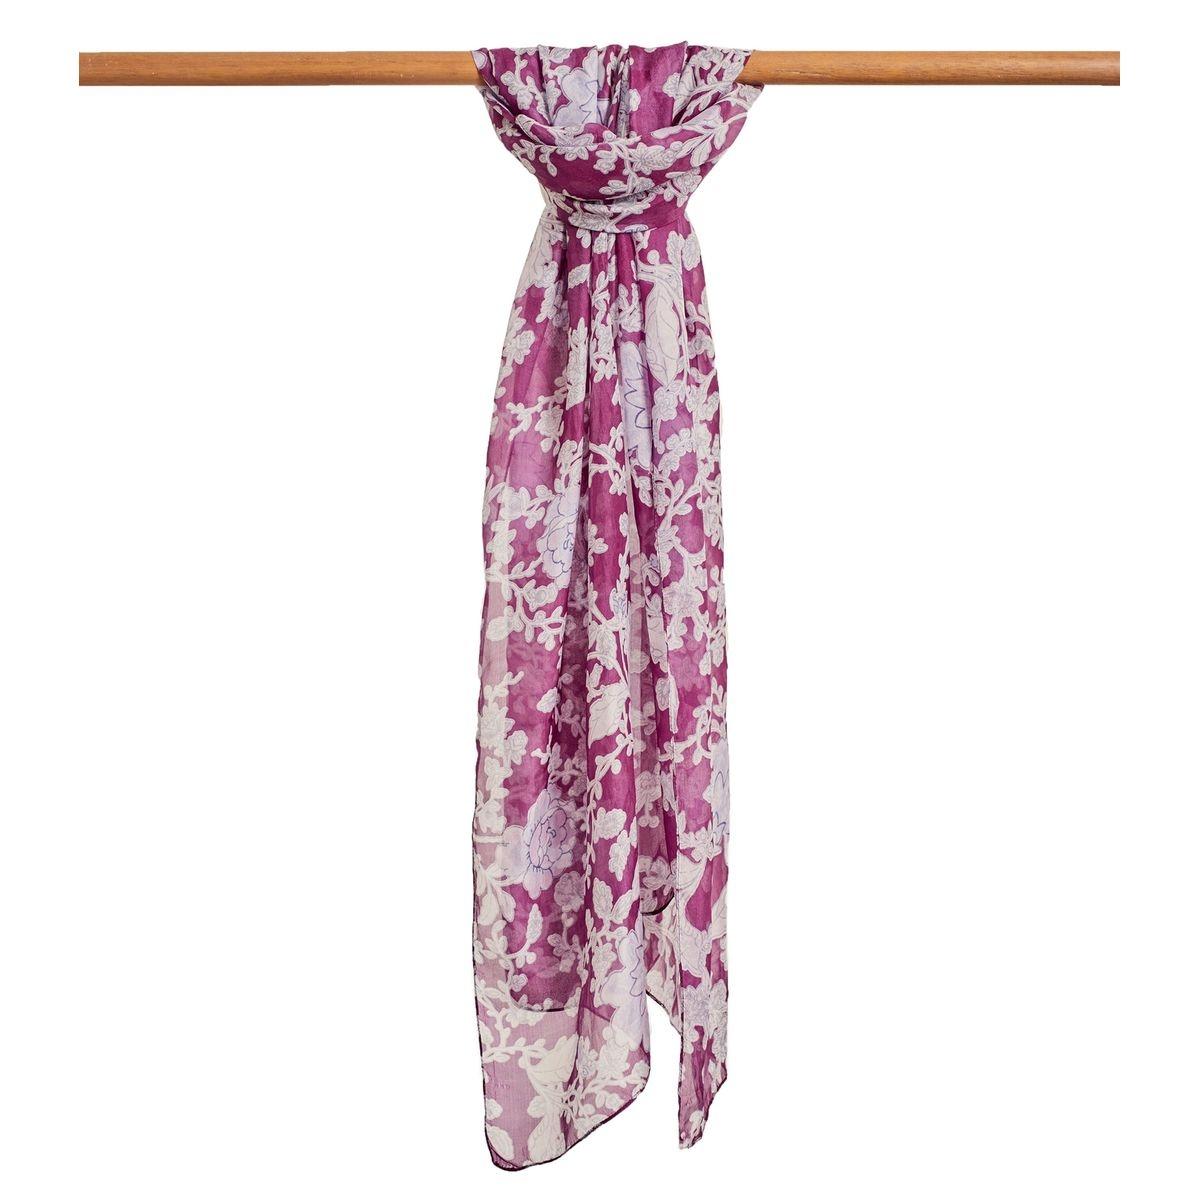 Foulard fleuri pure soie imprimé fleuri